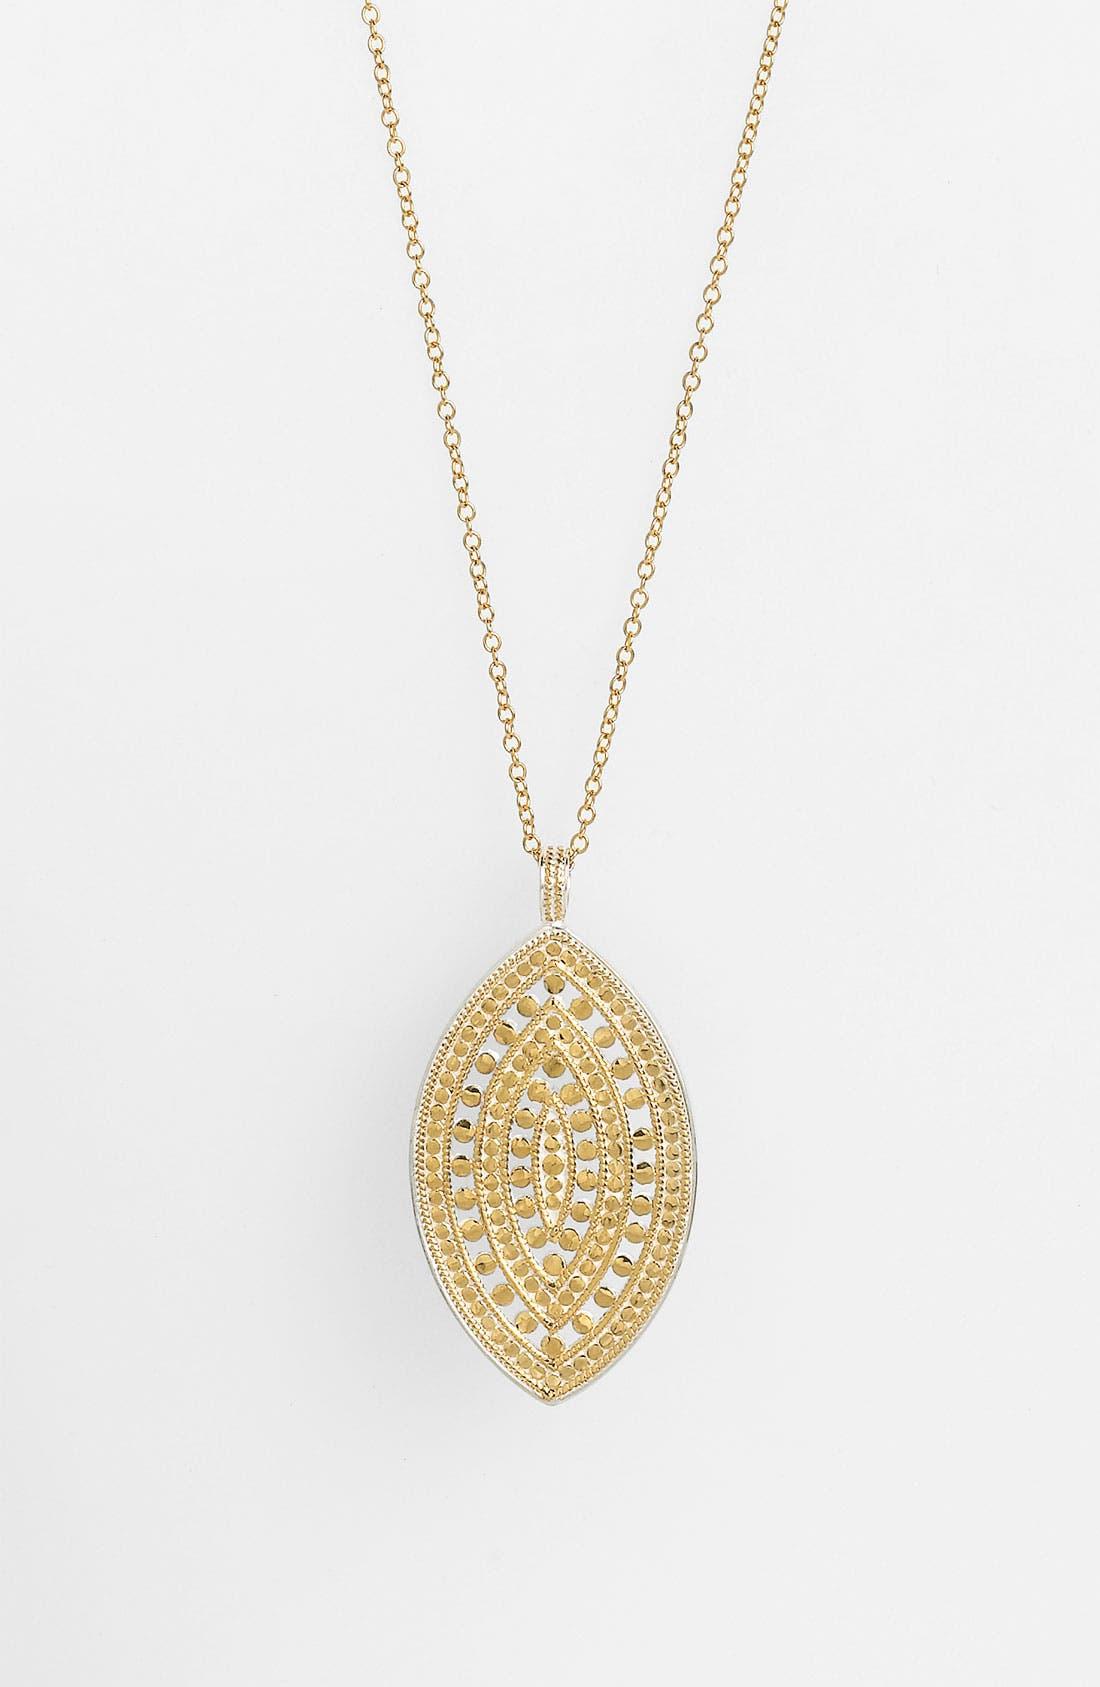 Main Image - Anna Beck 'Lombok' Long Leaf Pendant Necklace